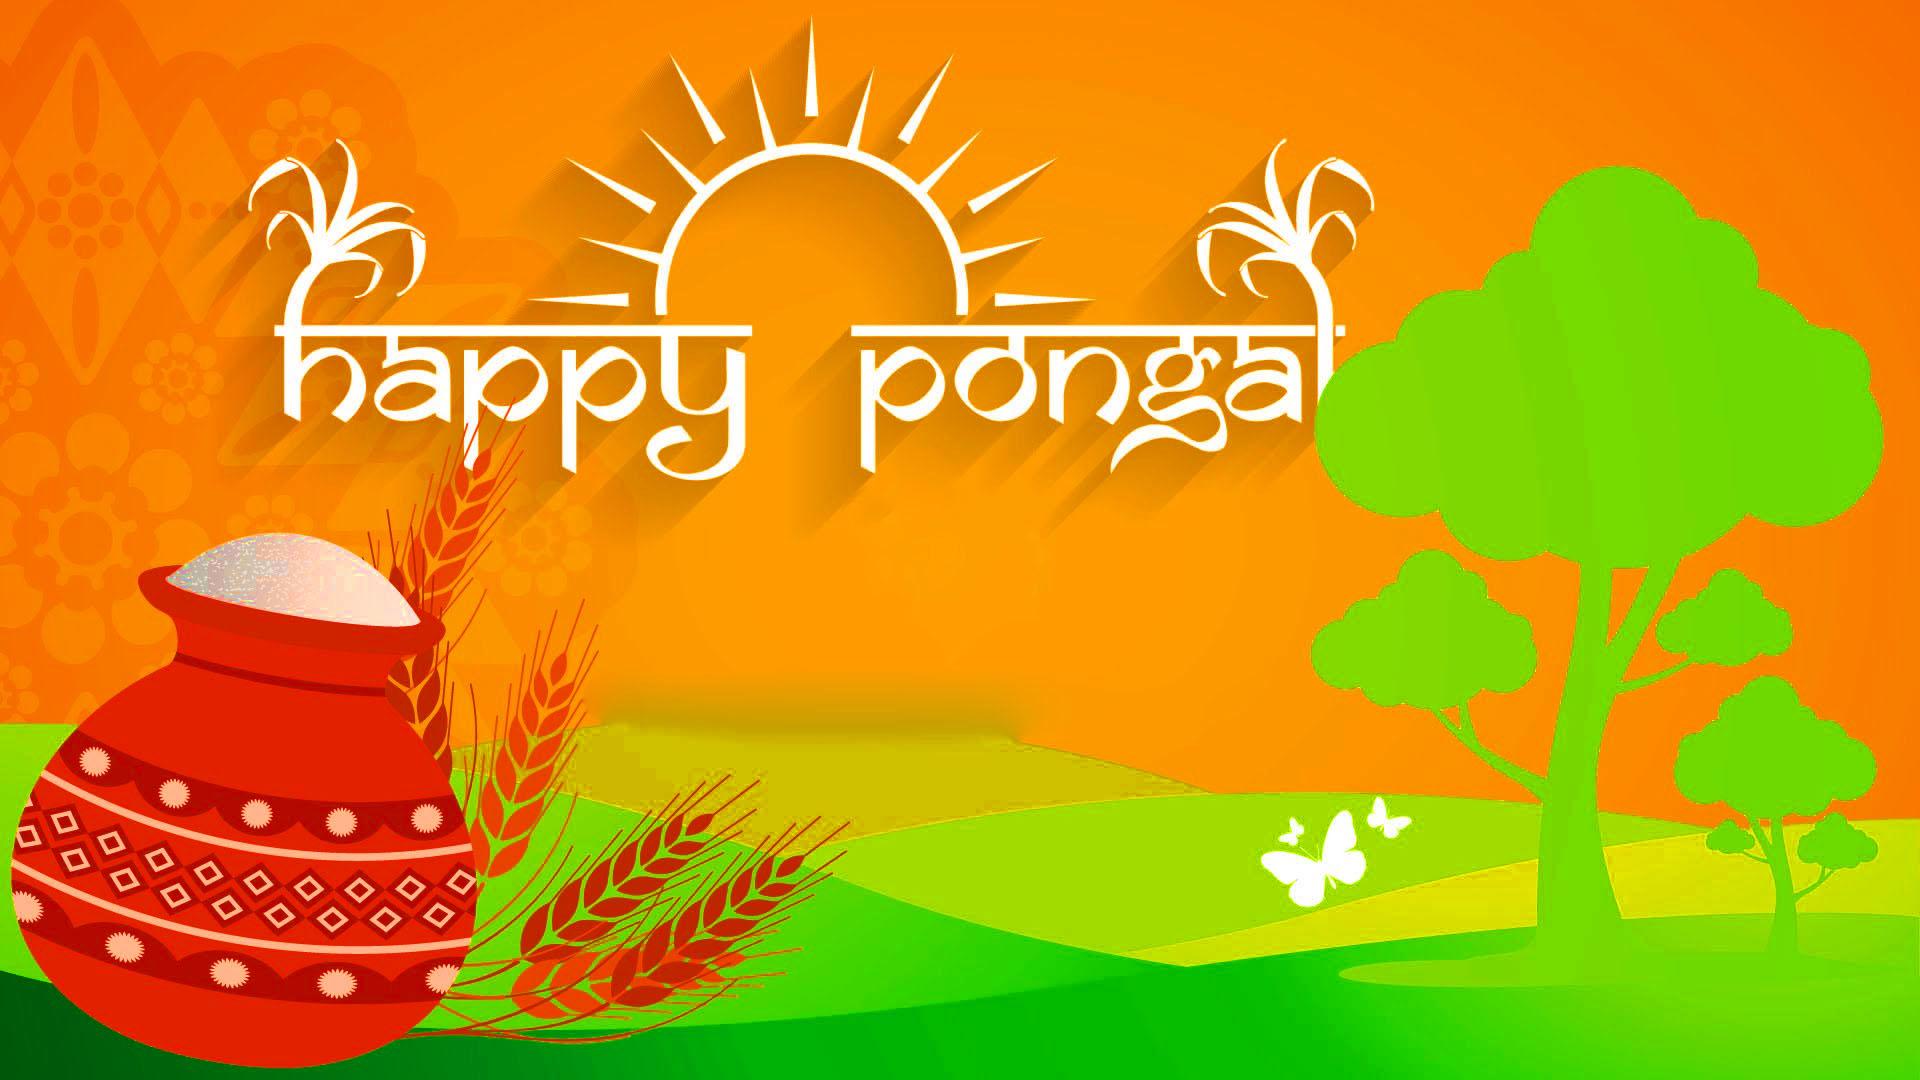 Happy Pongal Festival Wishes Pongal Rongoli Bihu Images